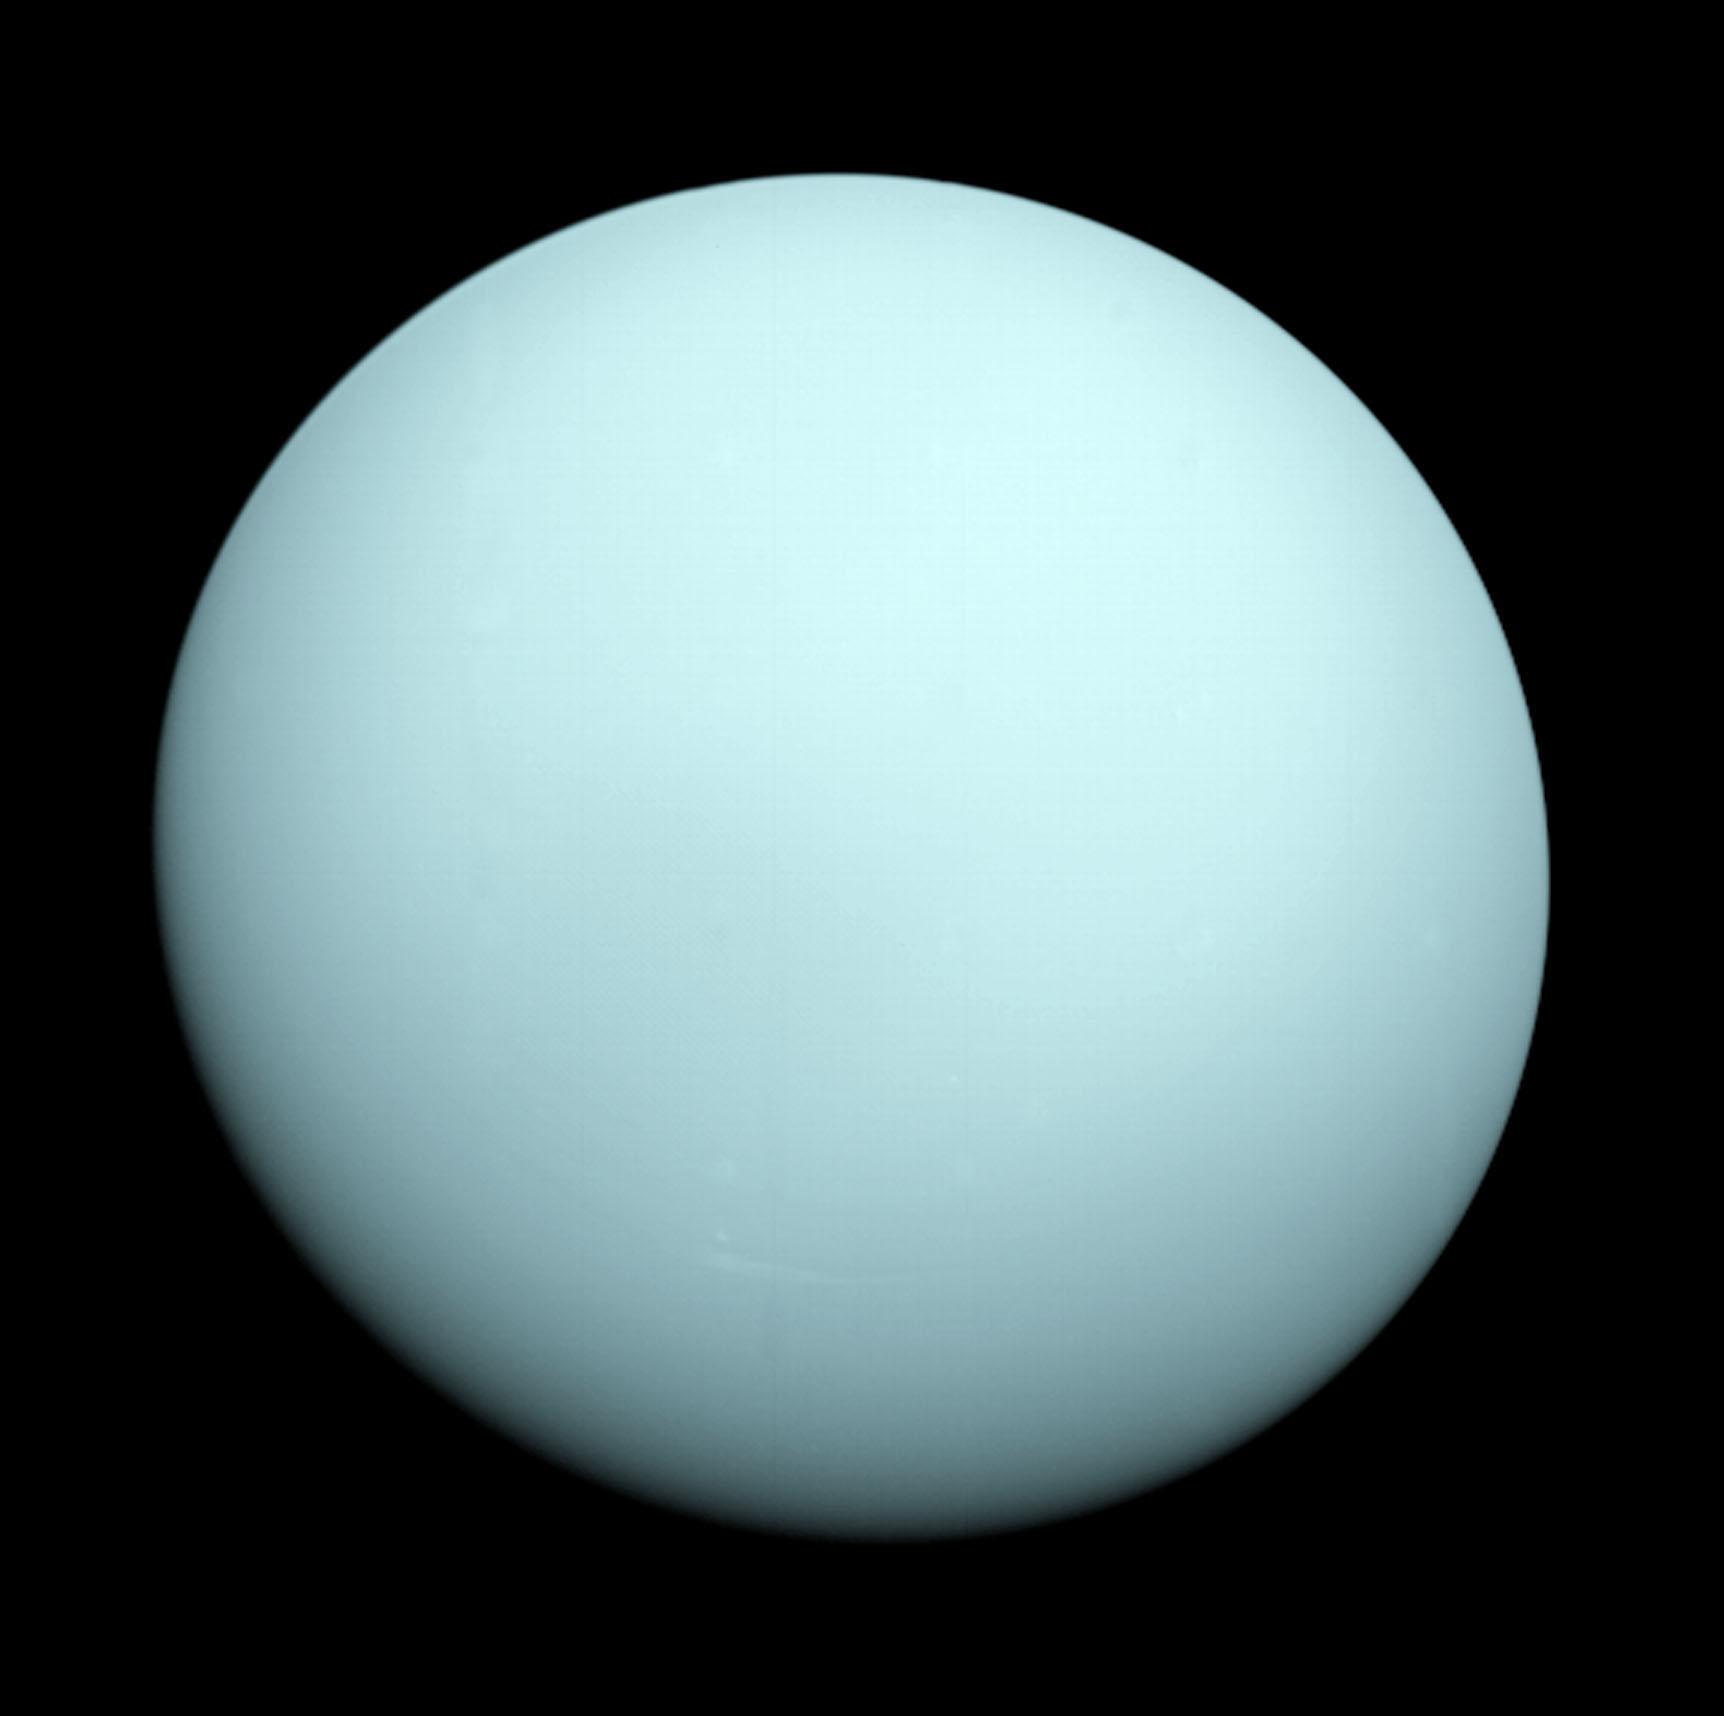 Uranus, as seen by Voyager (Image Credit: NASA/JPL)